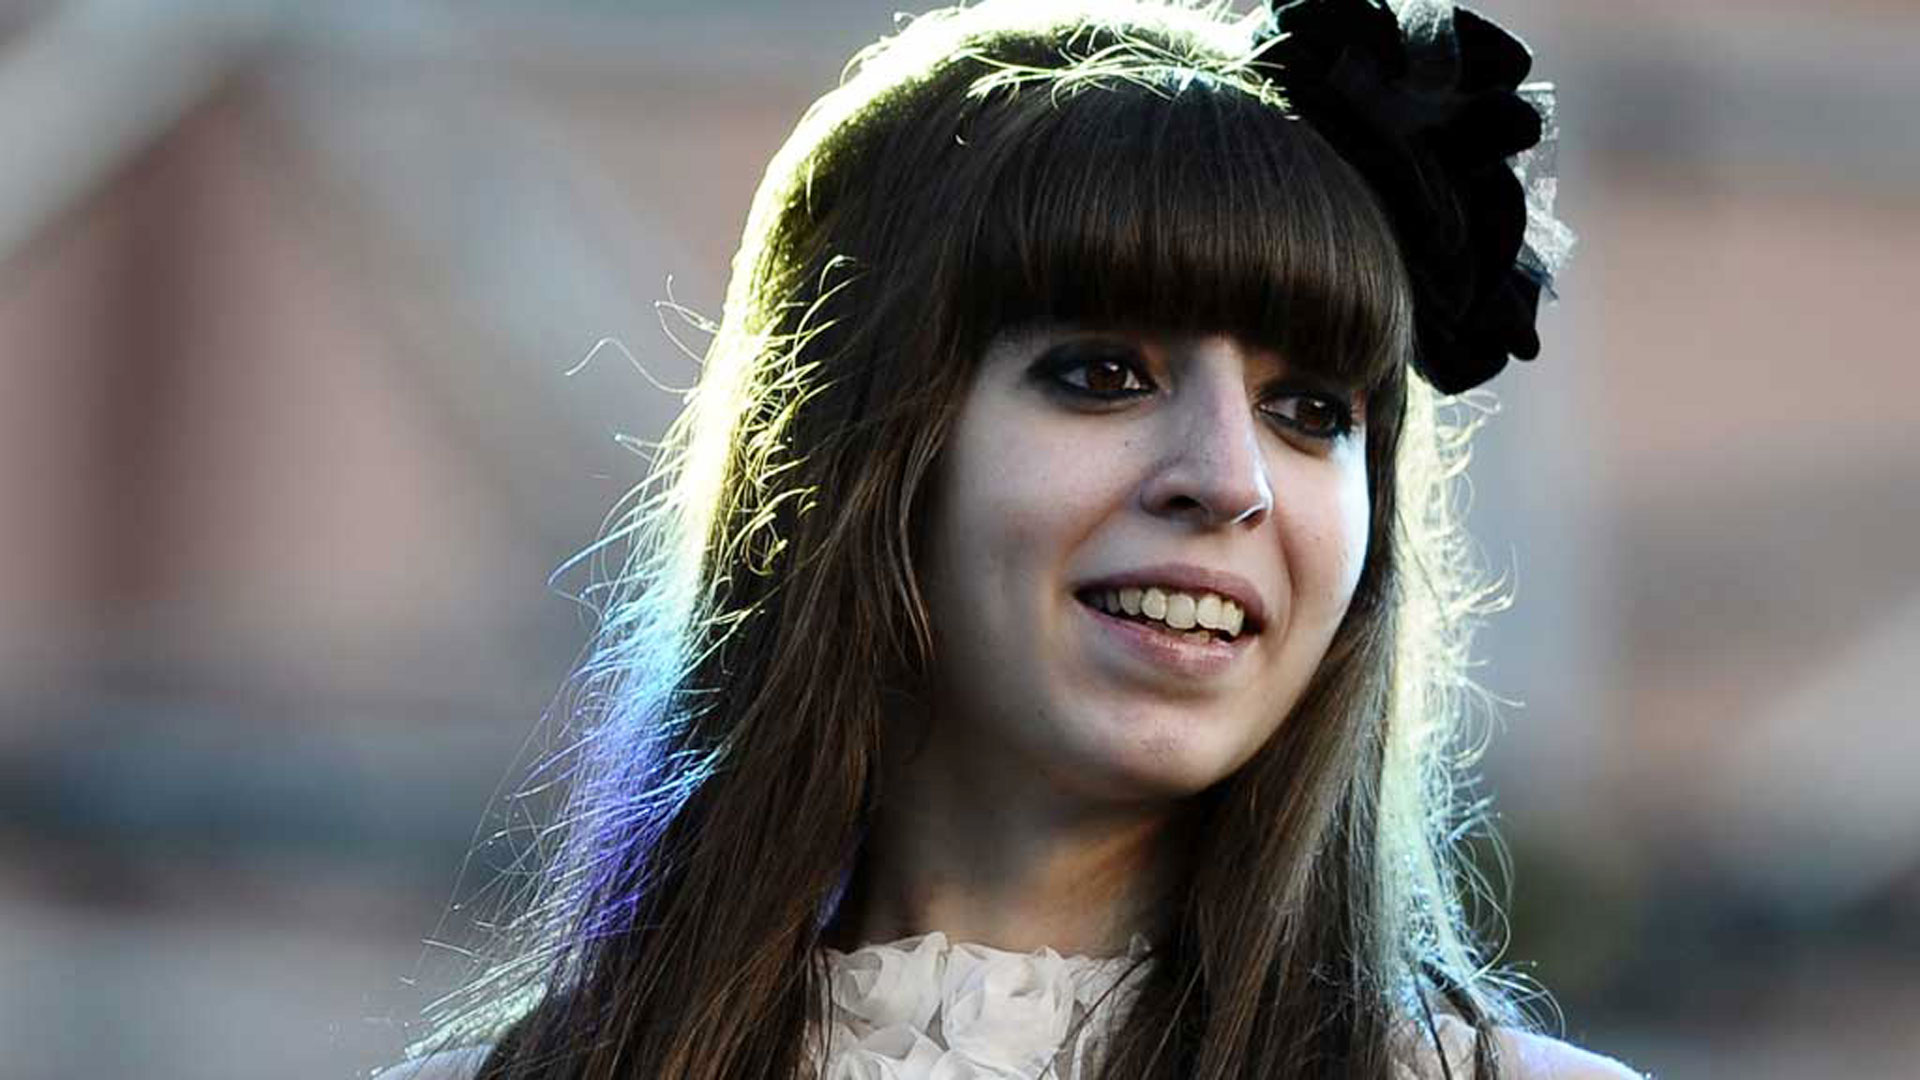 Florencia Kirchner. La hija de Néstor y Cristina Kirchner se encuentra en Cuba